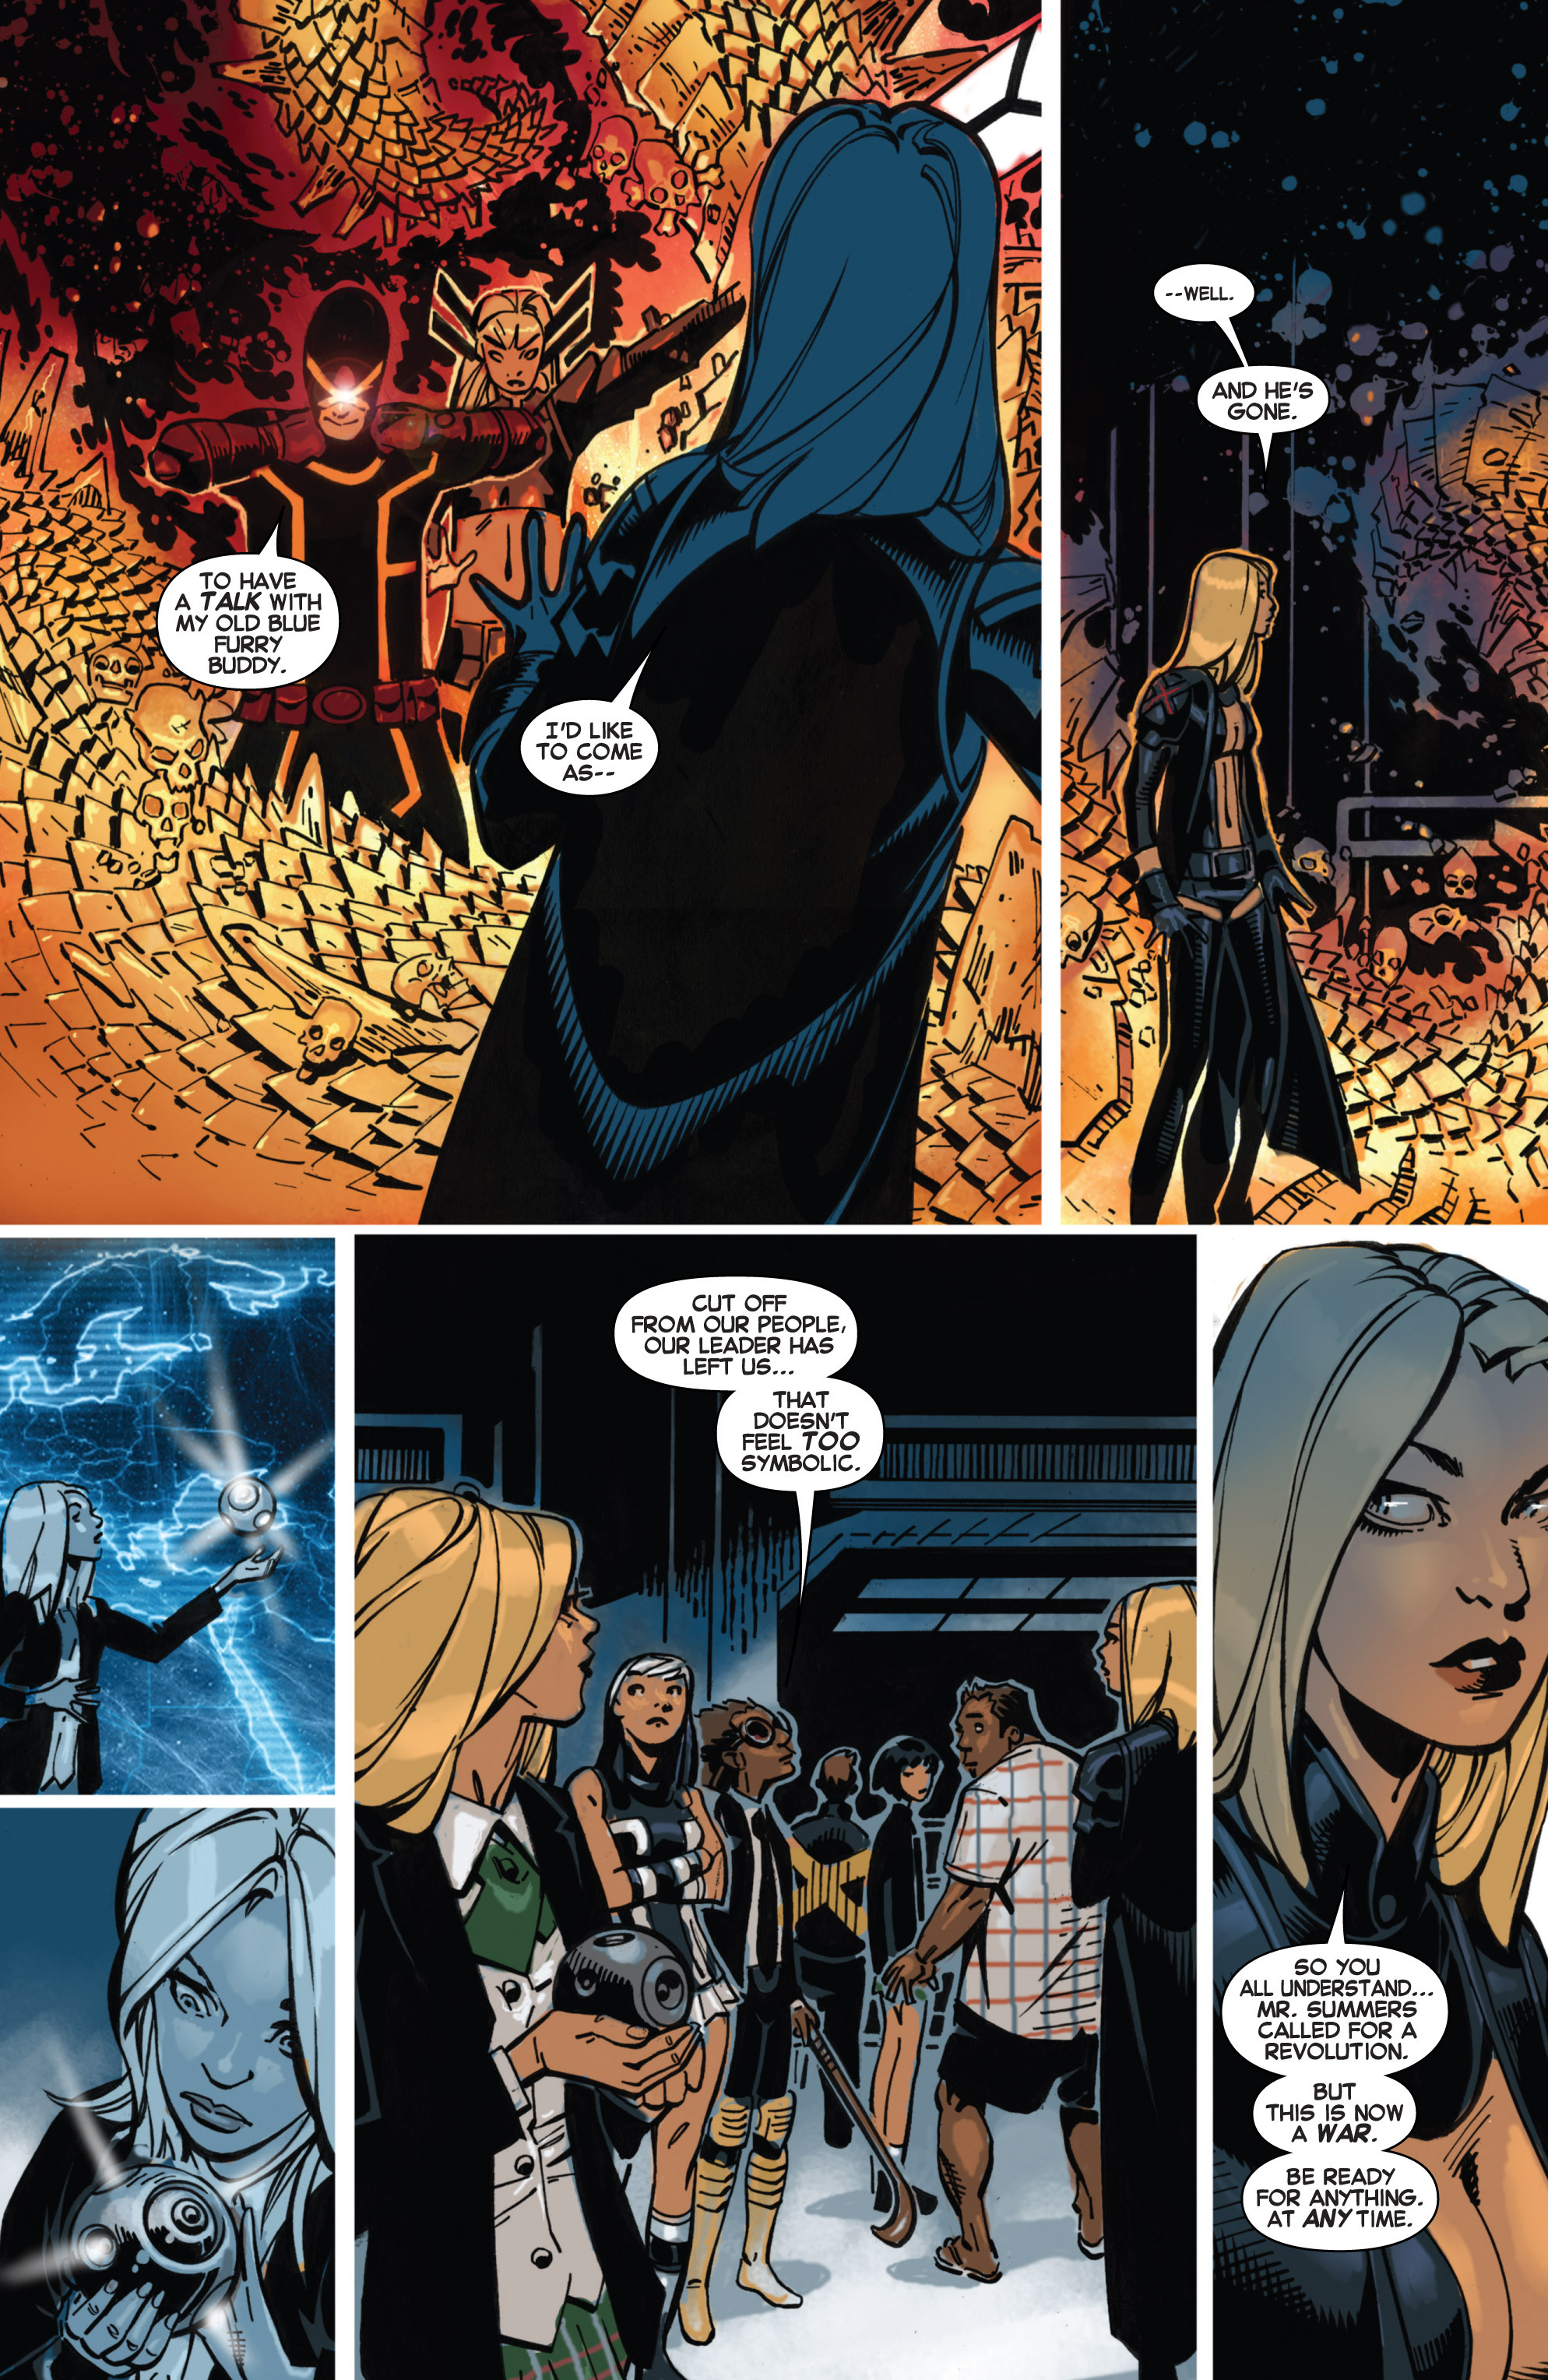 Read online Uncanny X-Men (2013) comic -  Issue # _TPB 4 - vs. S.H.I.E.L.D - 38